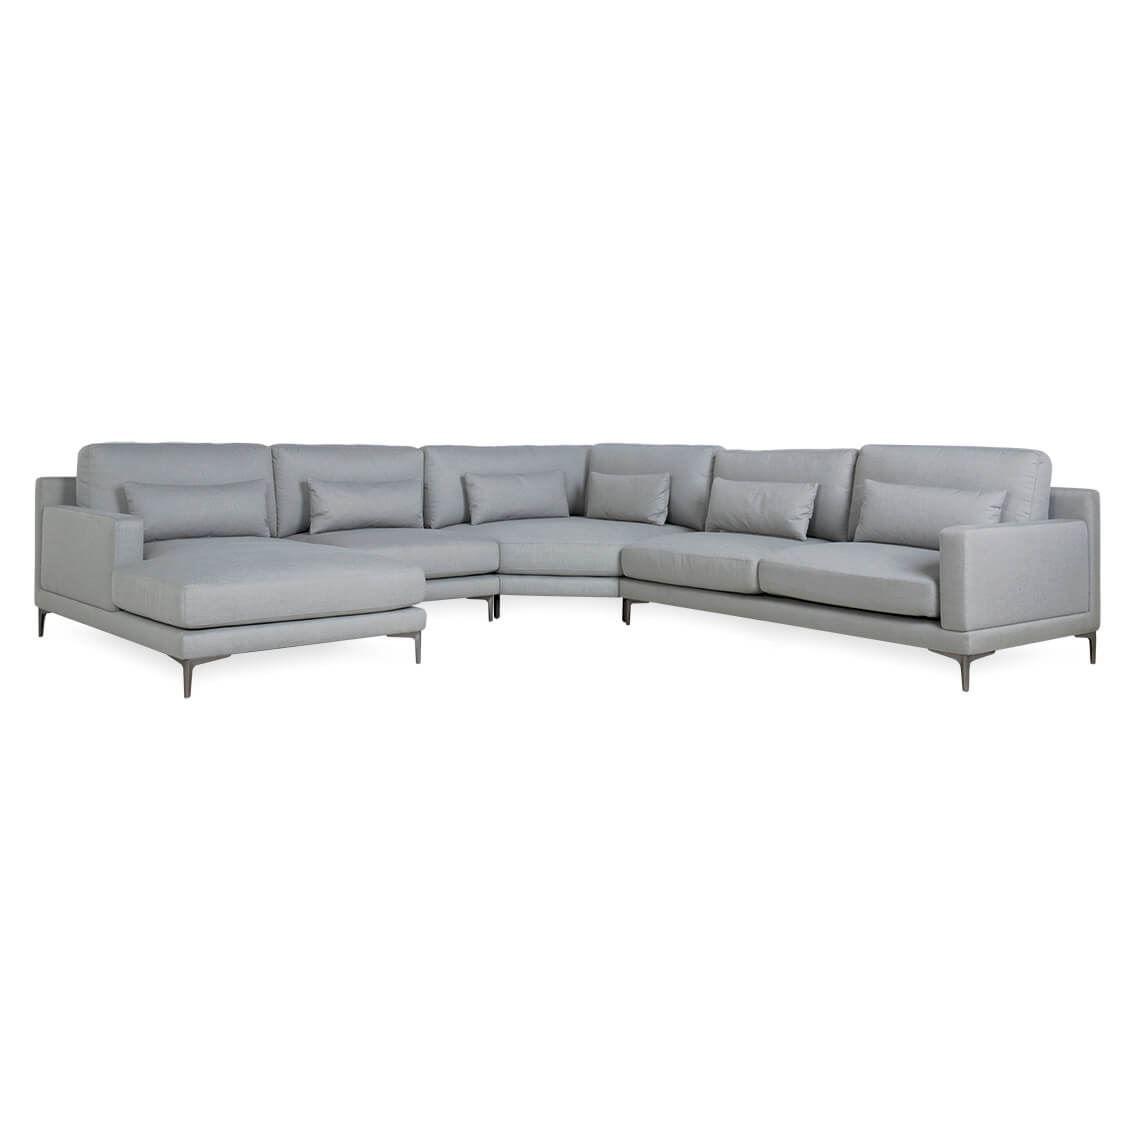 Kin 6 Seat Fabric Corner Modular Sofa With Left Chaise Grey Modular Sofa Chaise Sofa